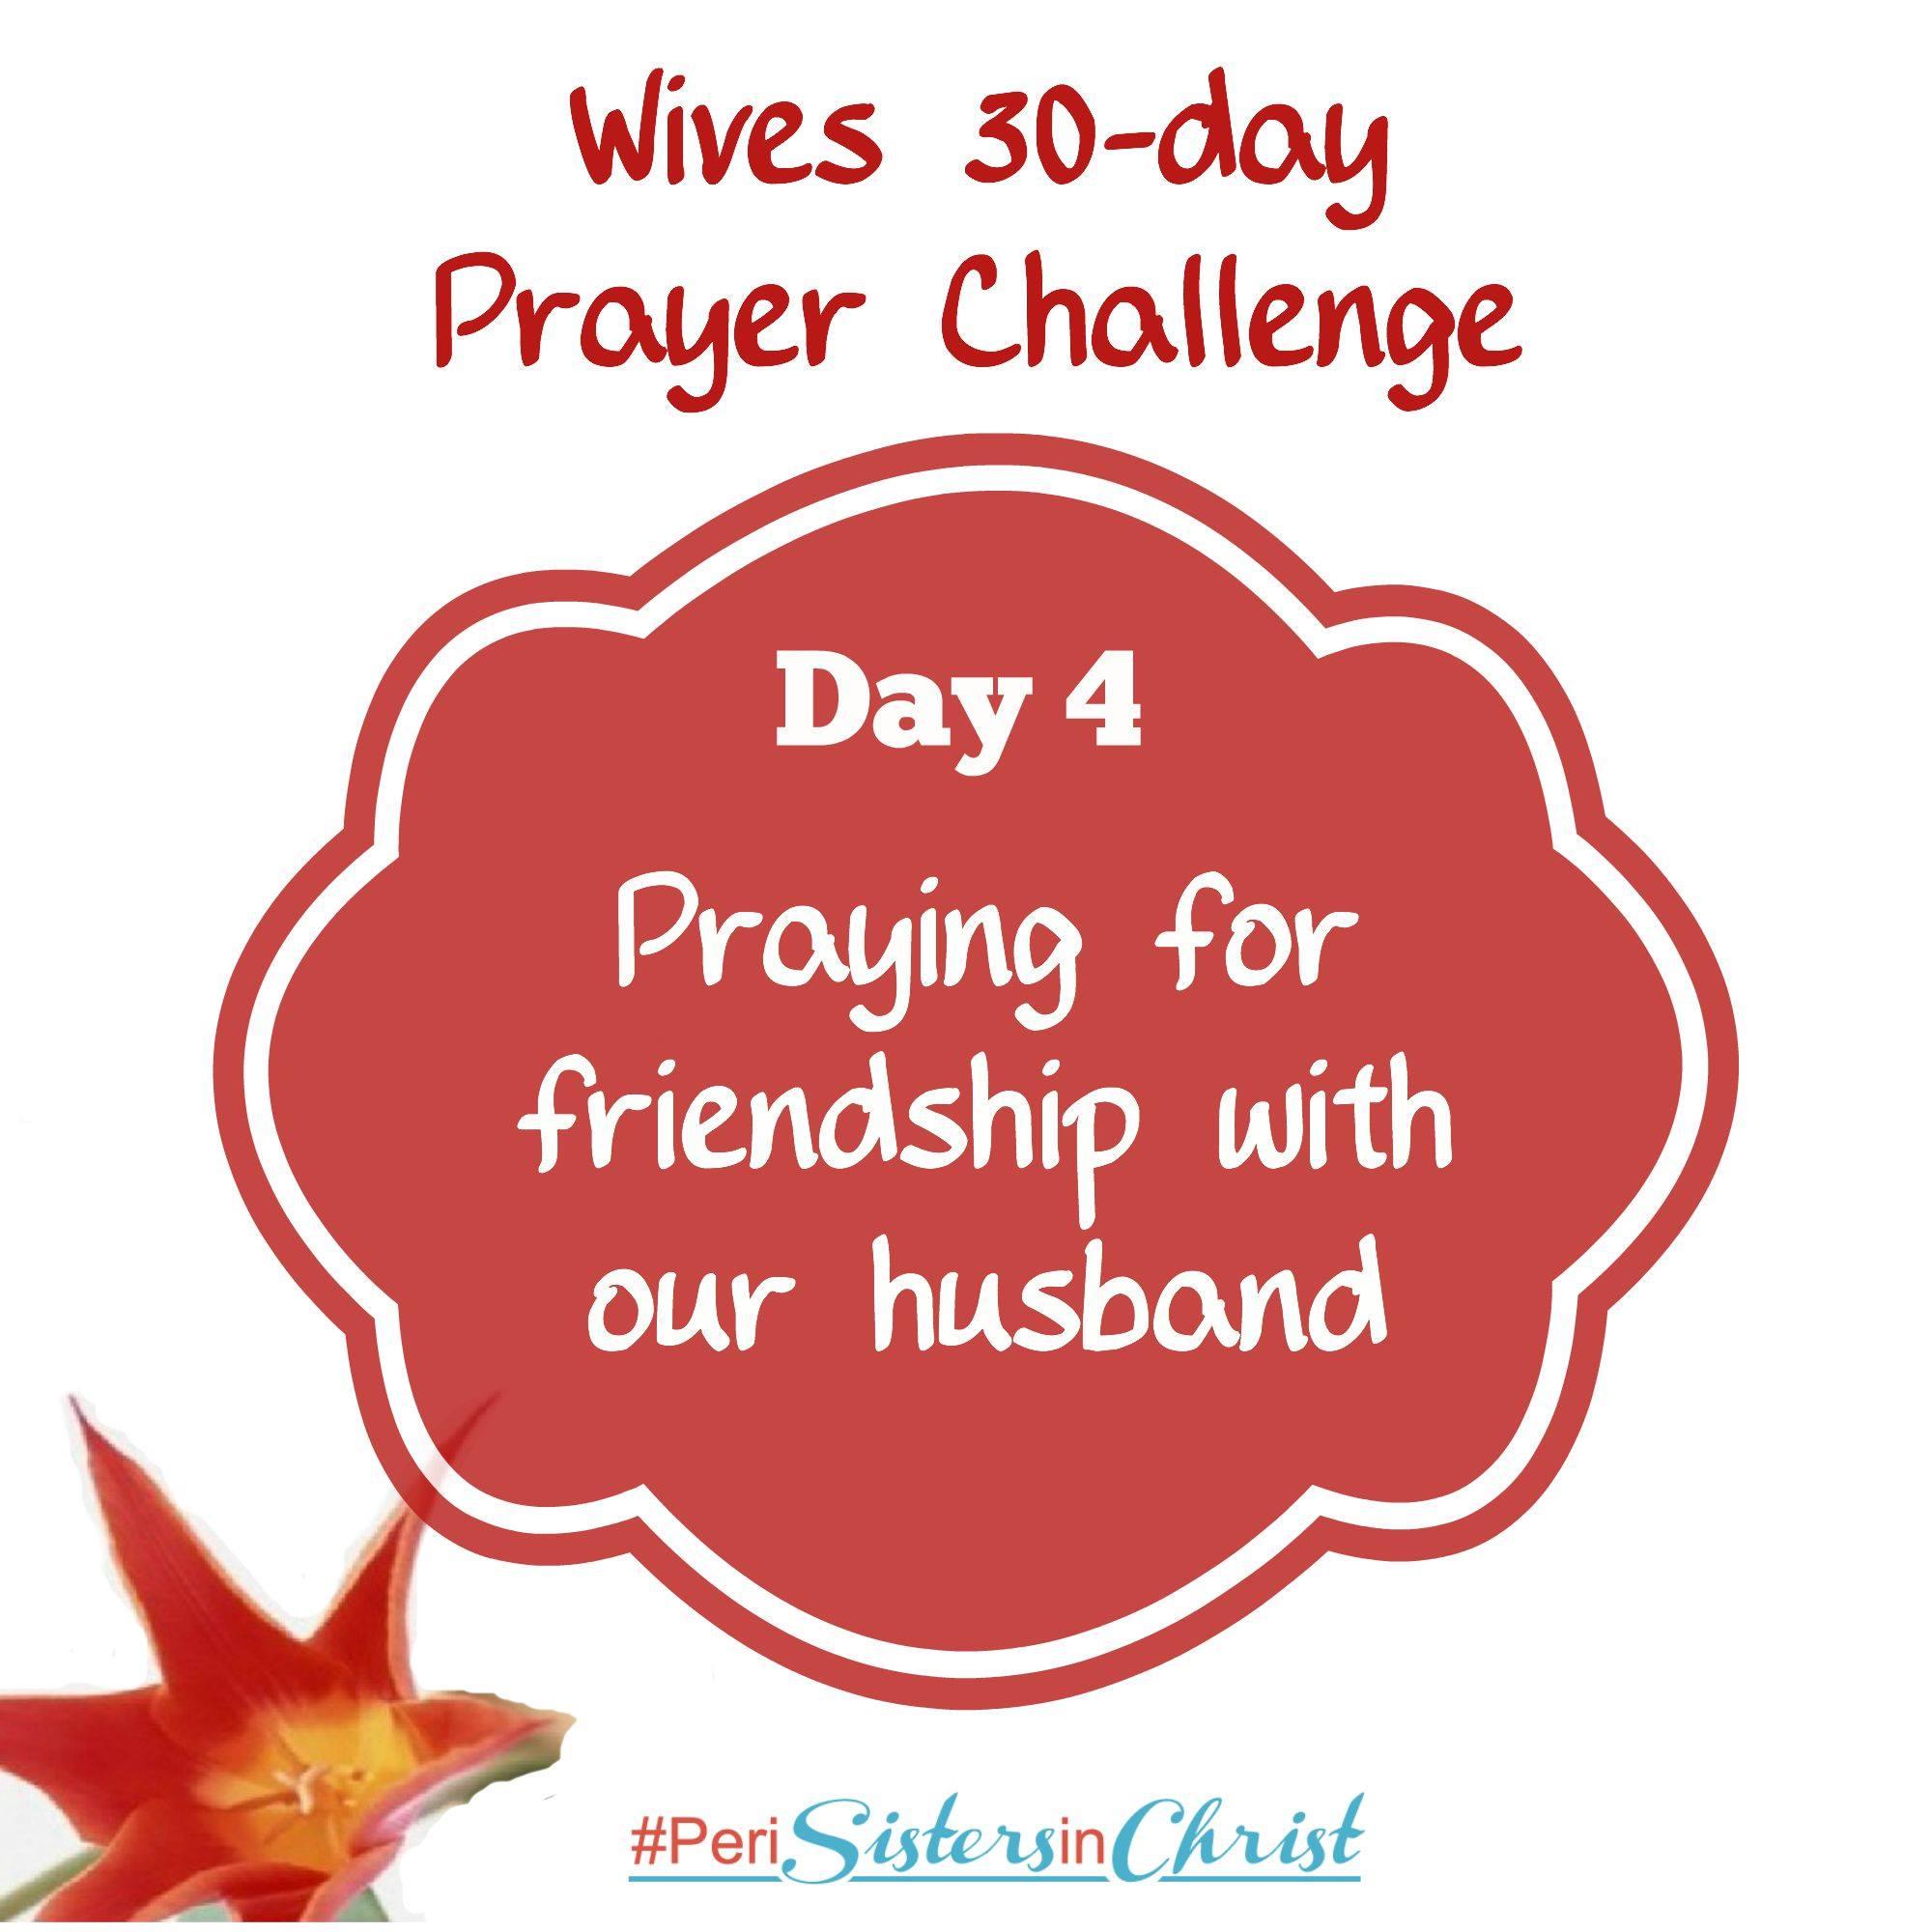 Marriage Prayer Challenge Day 4